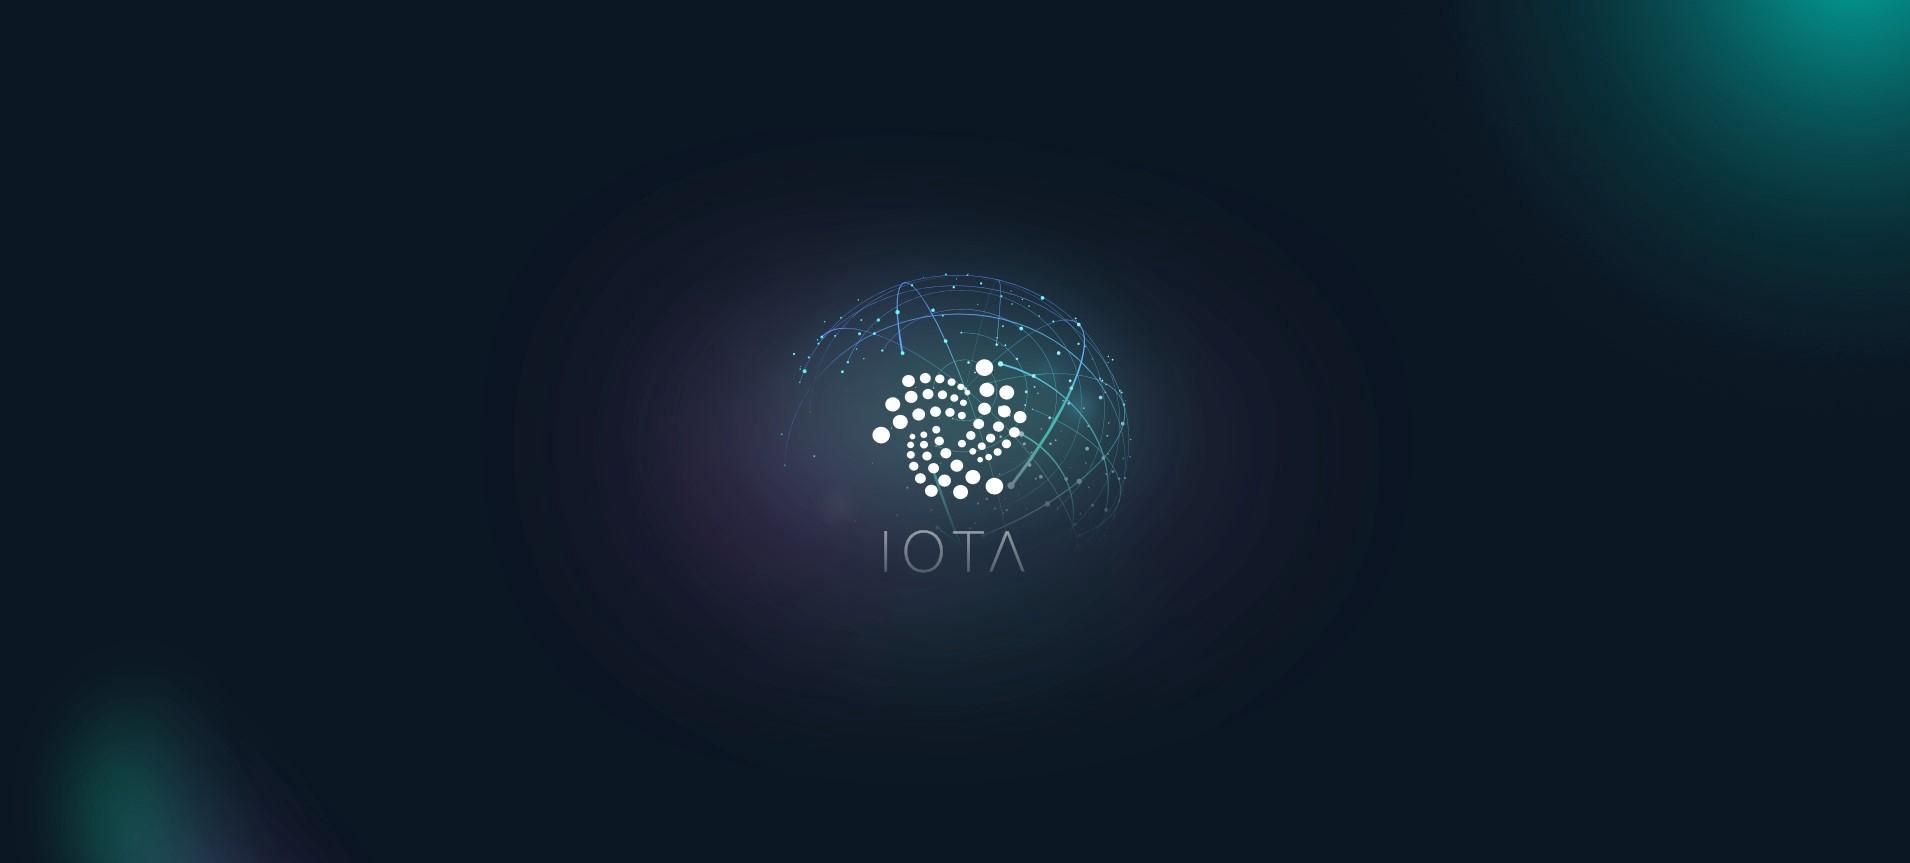 Iota ready